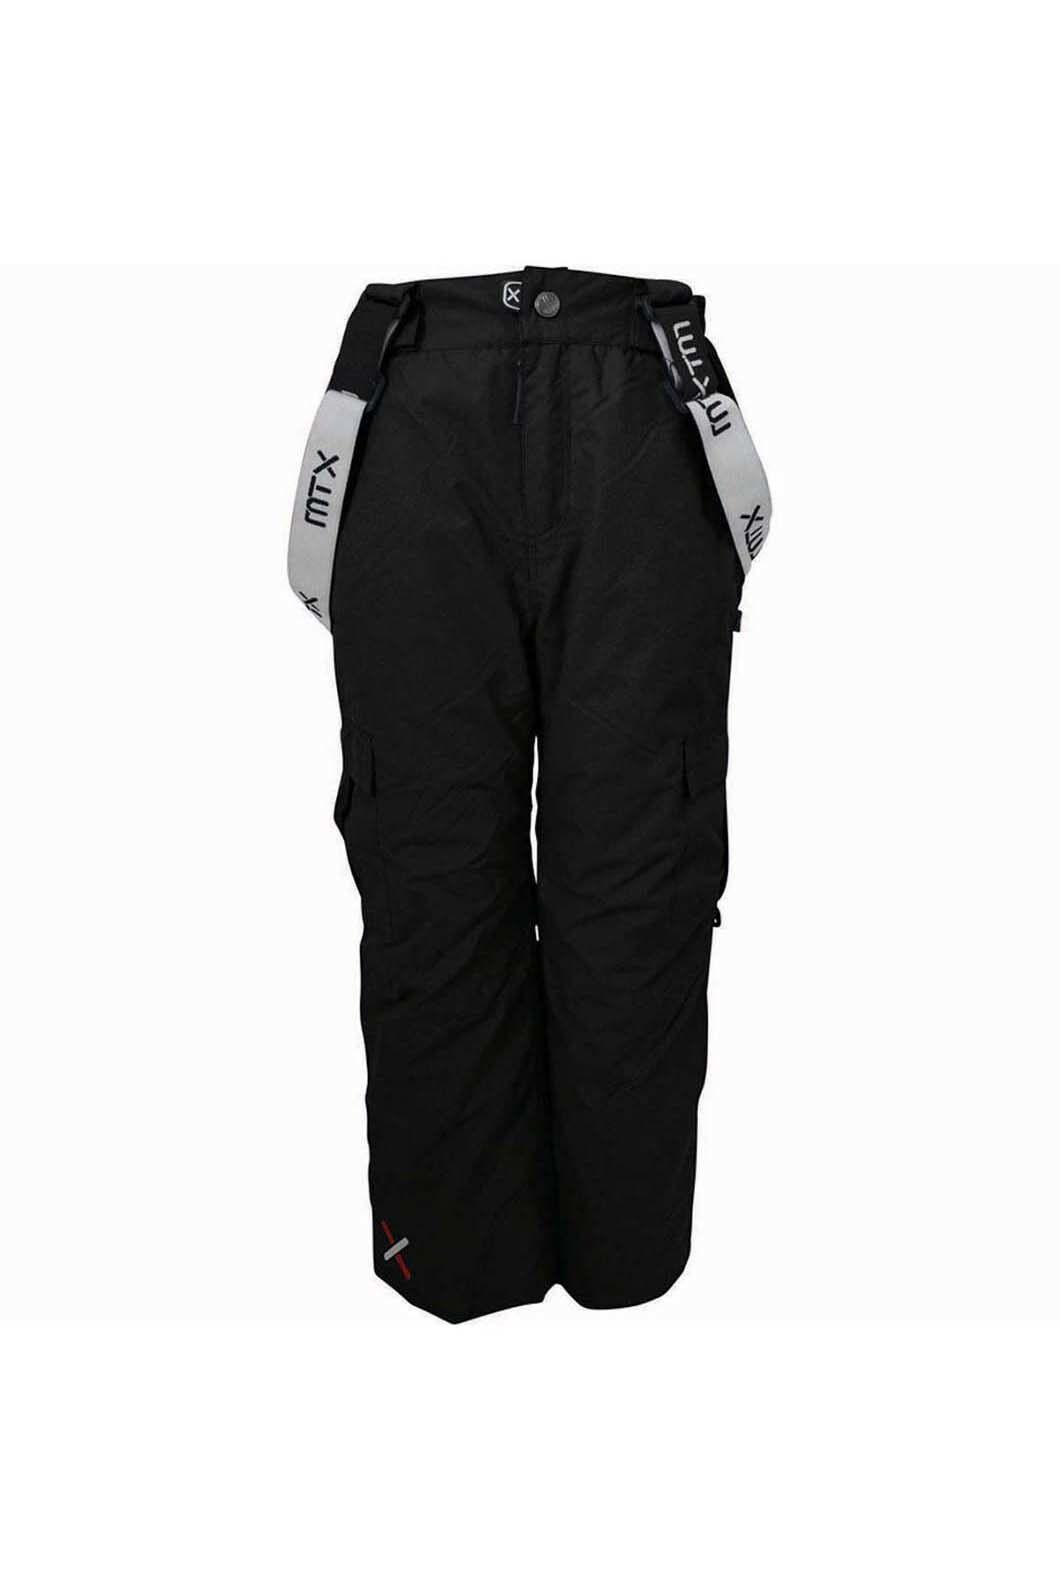 XTM Kids' Scoobie Pant, Black, hi-res